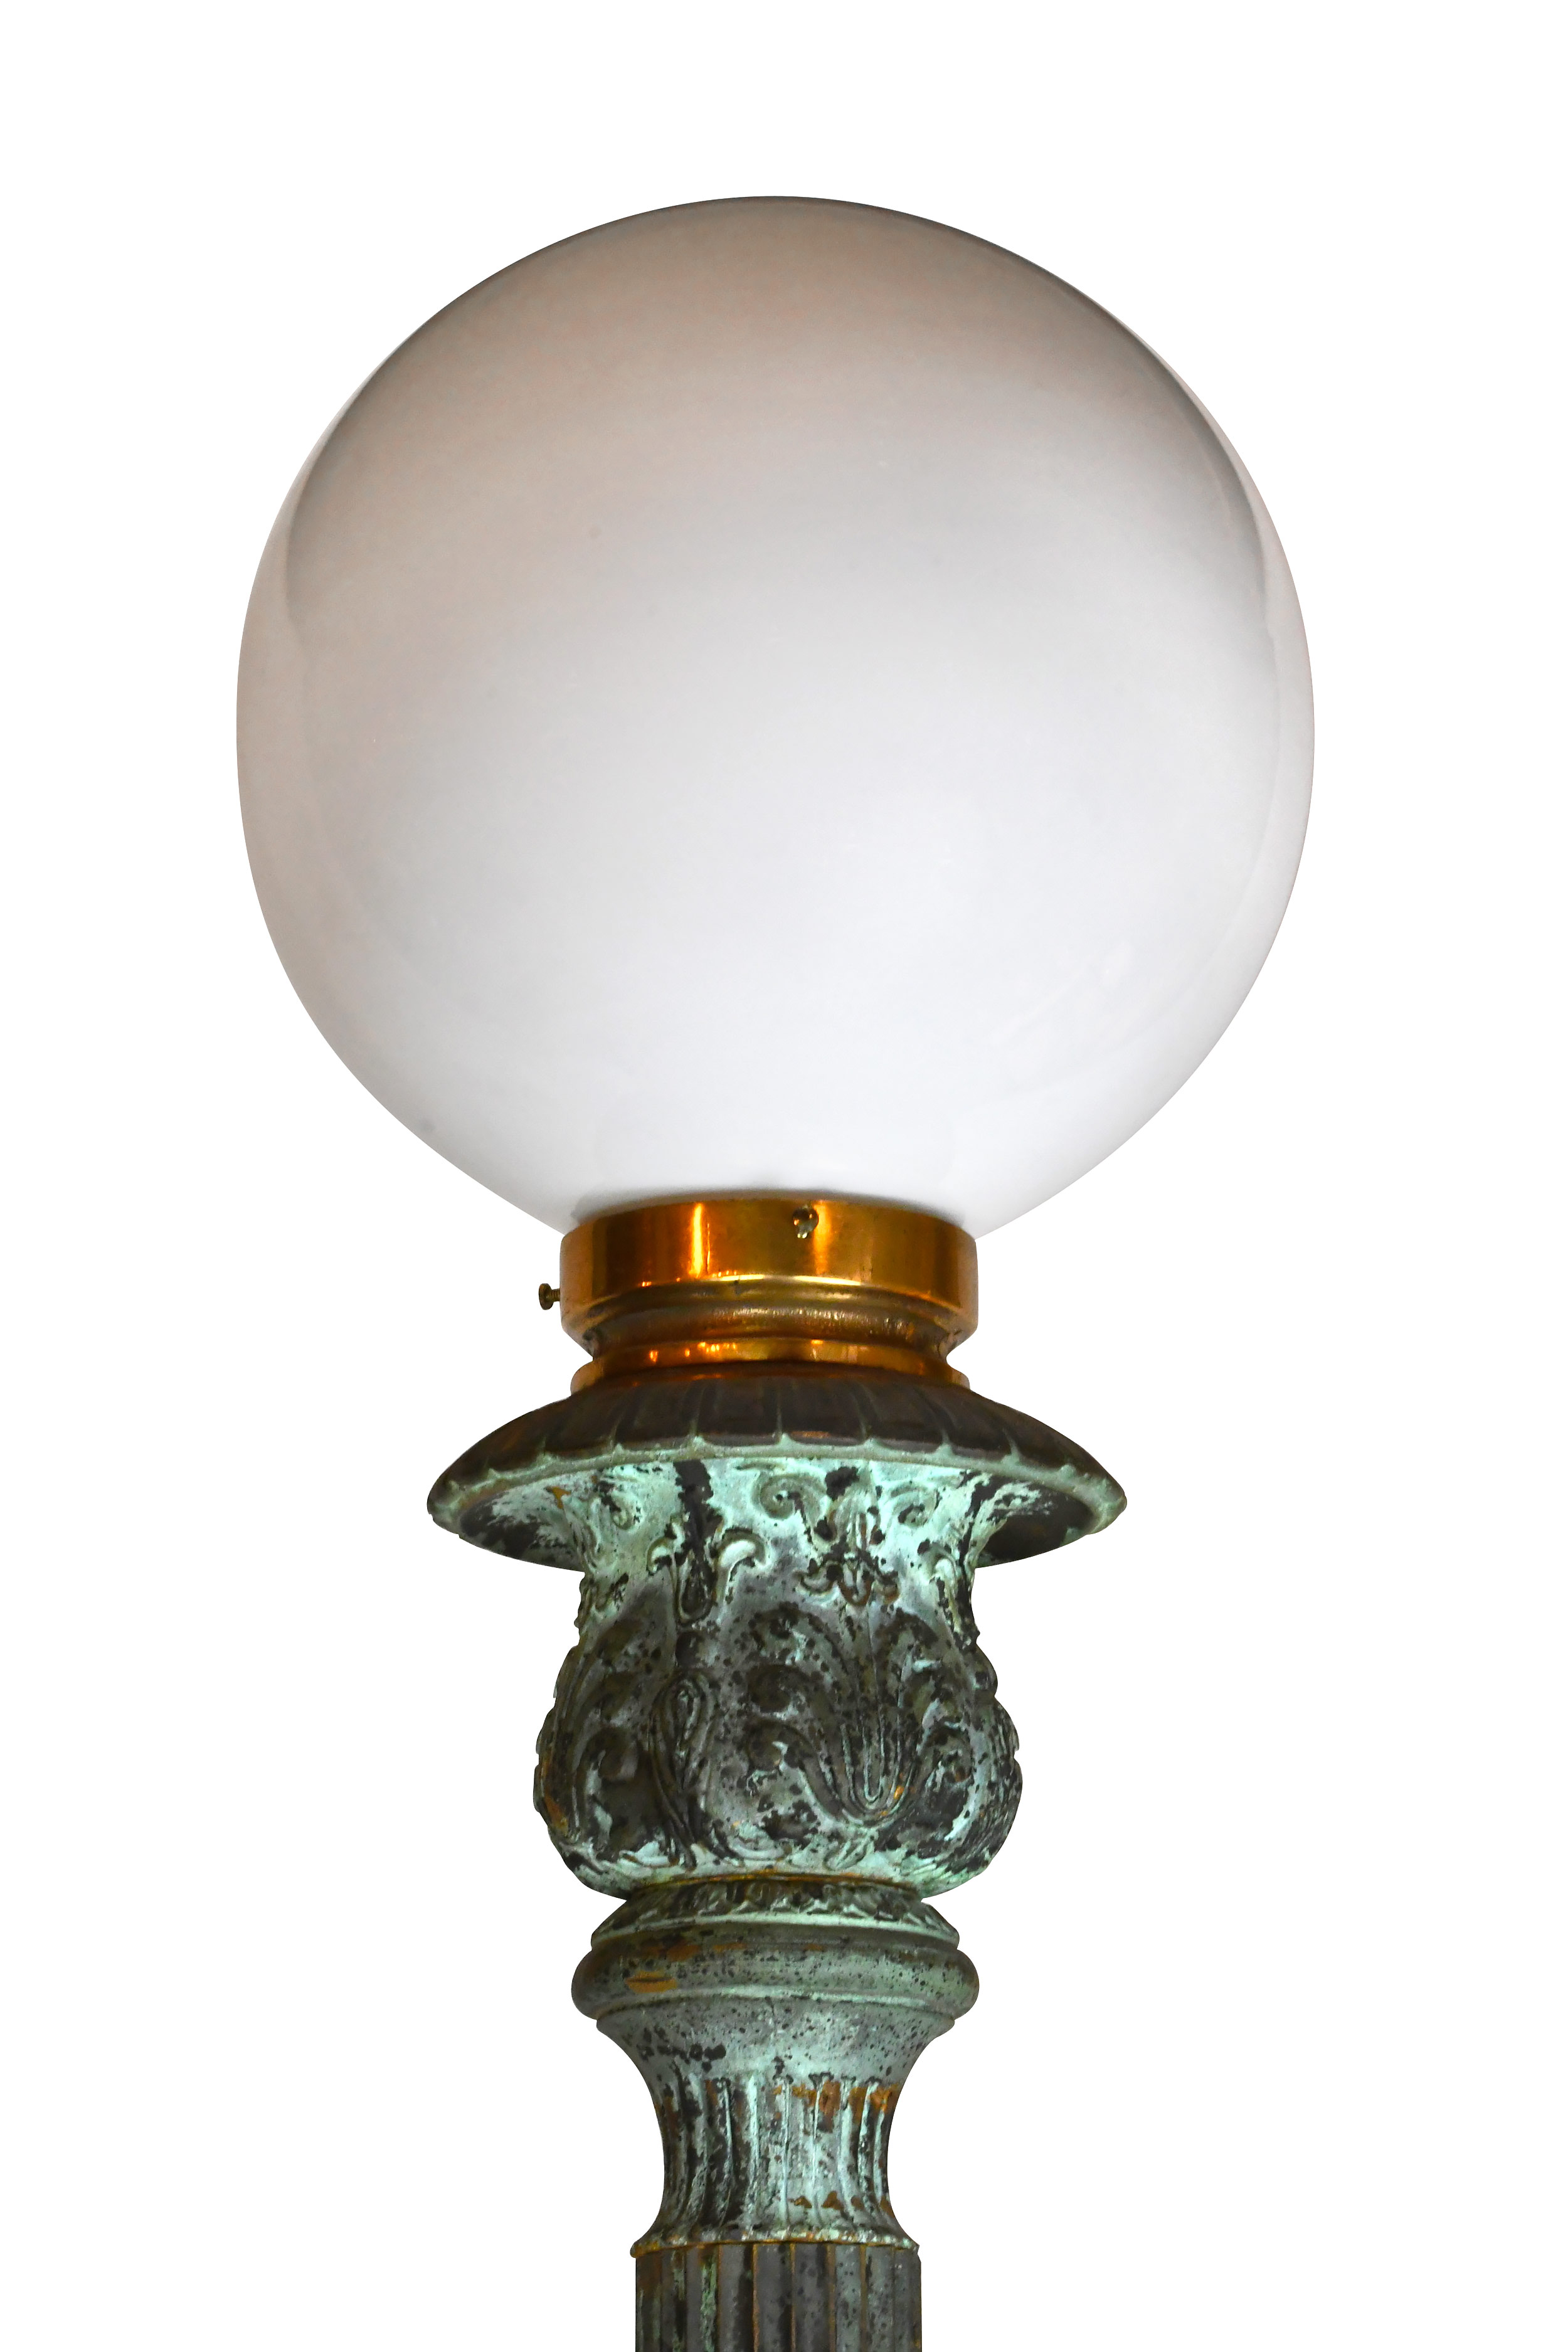 47586-bronze-street-light-bulb-1-edit.jpg